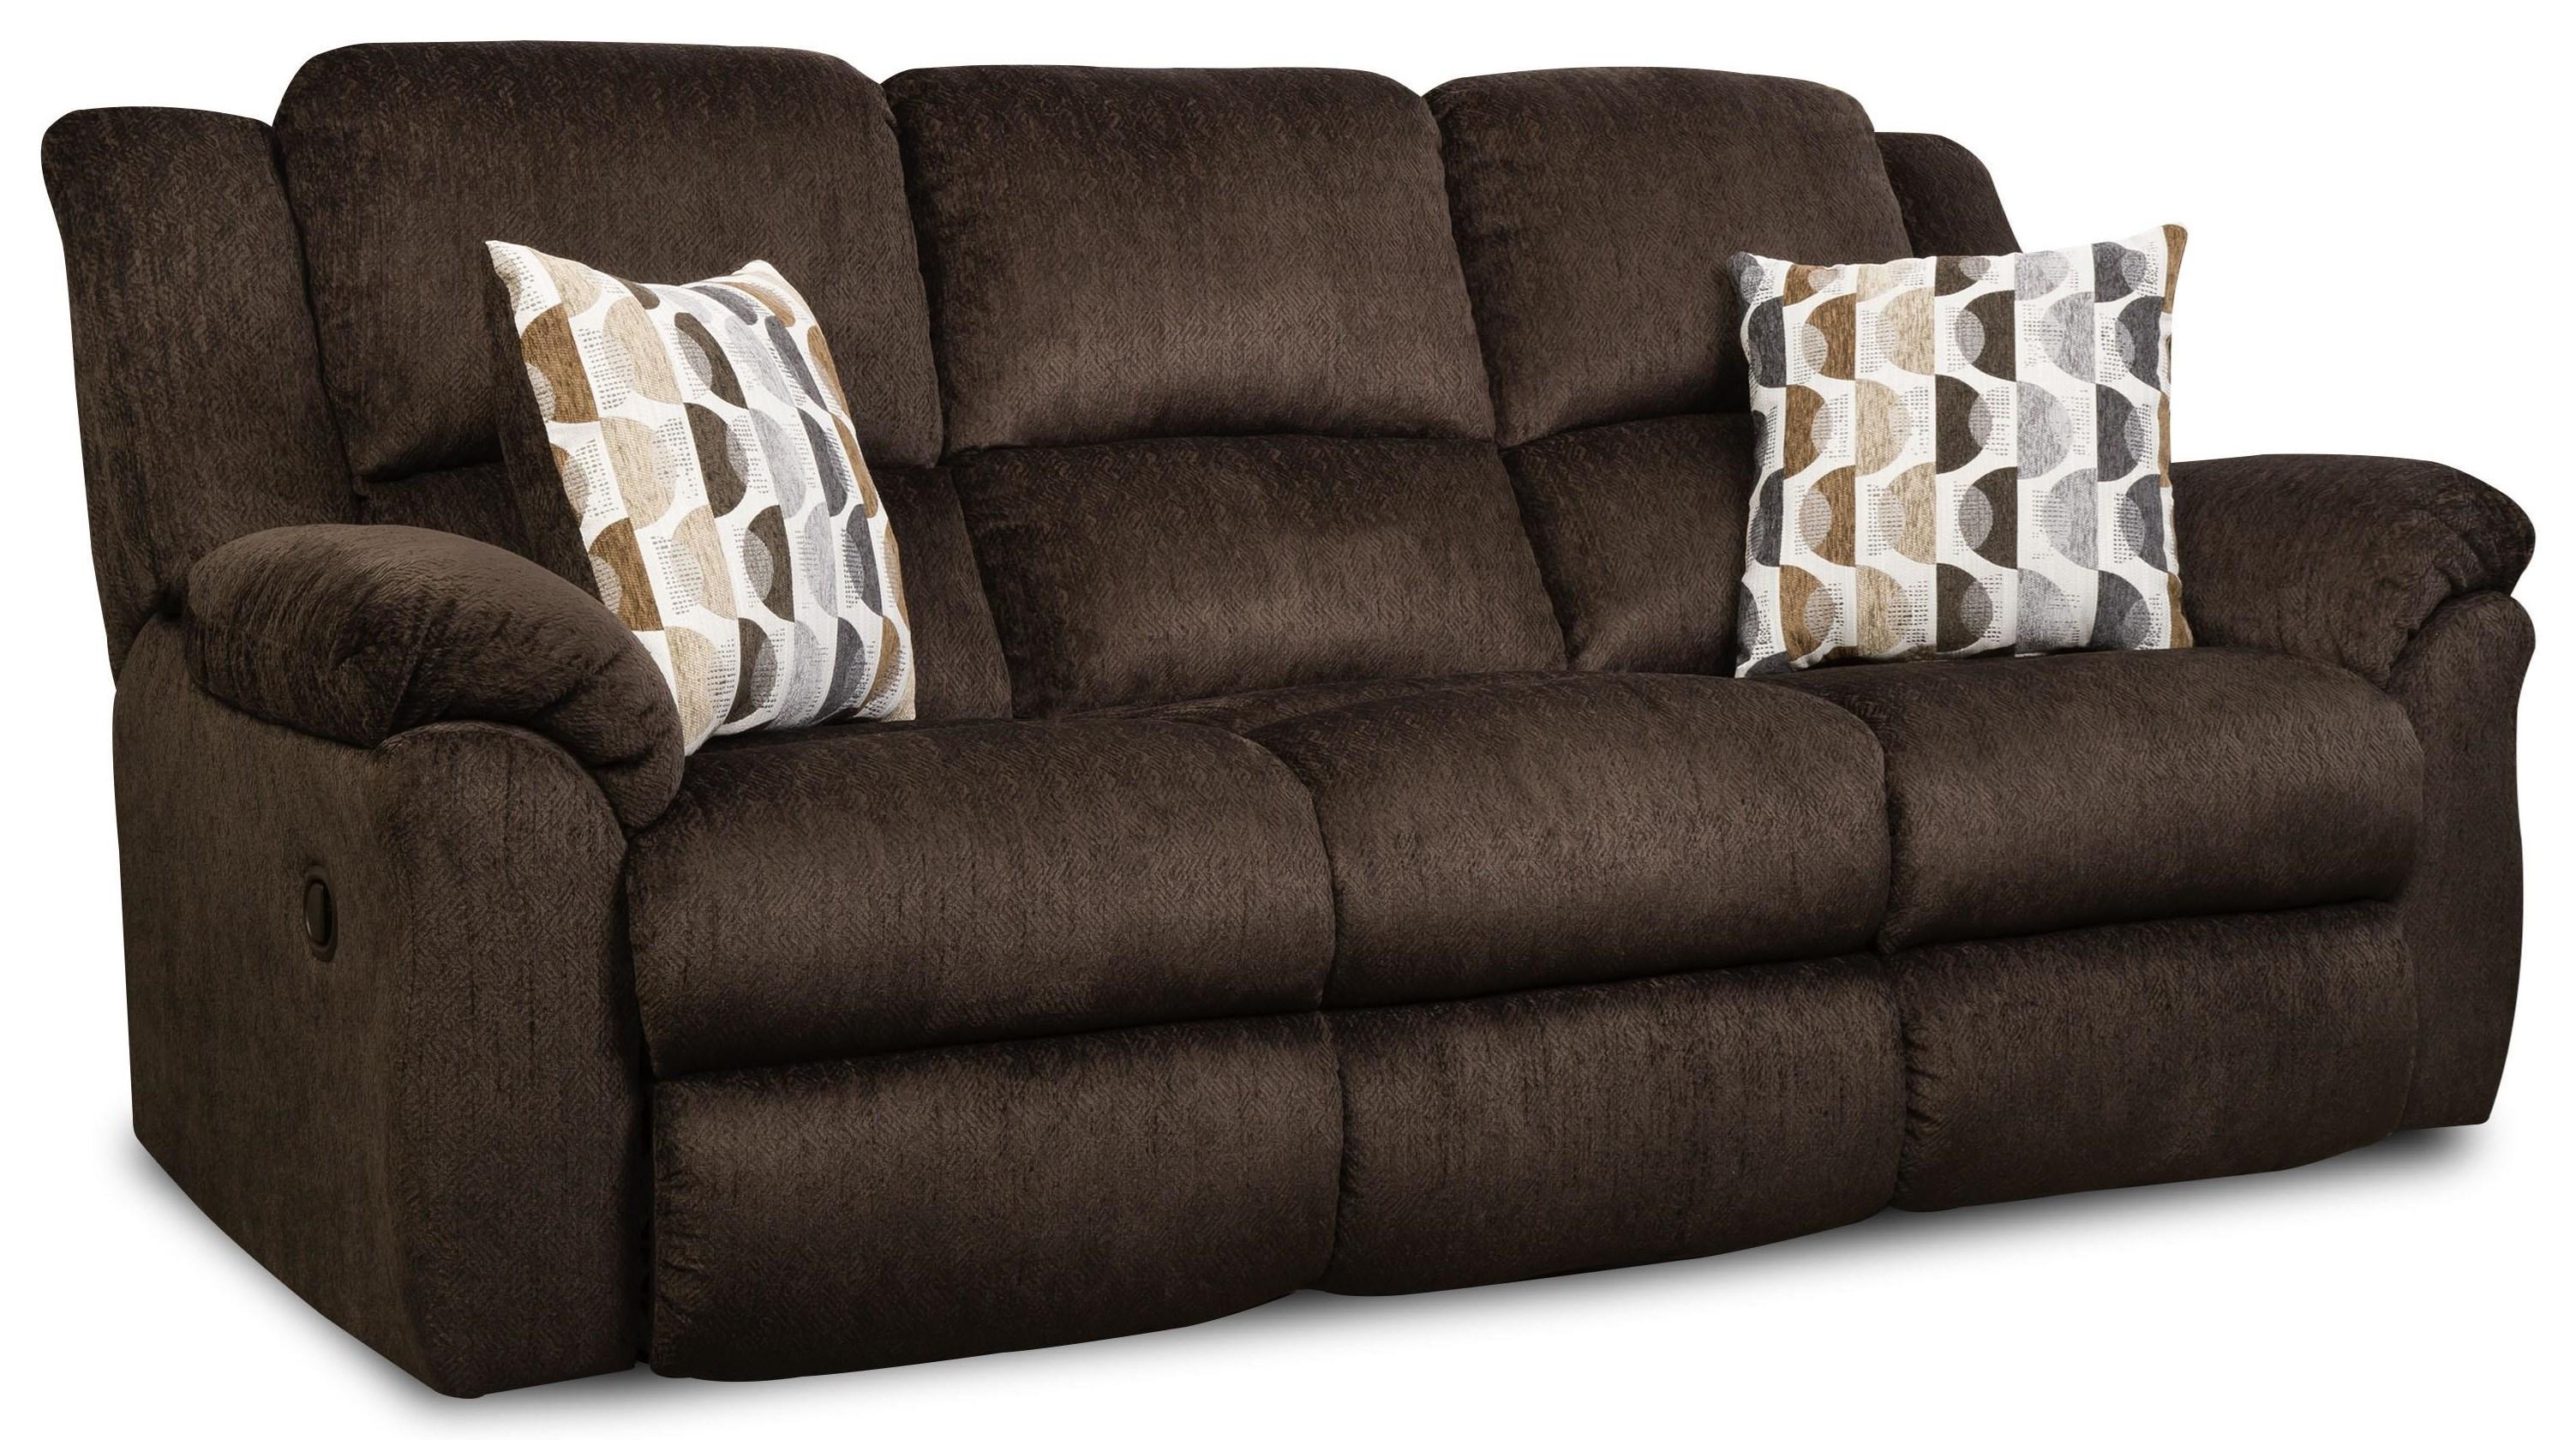 173 Reclining Sofa by HomeStretch at Johnny Janosik